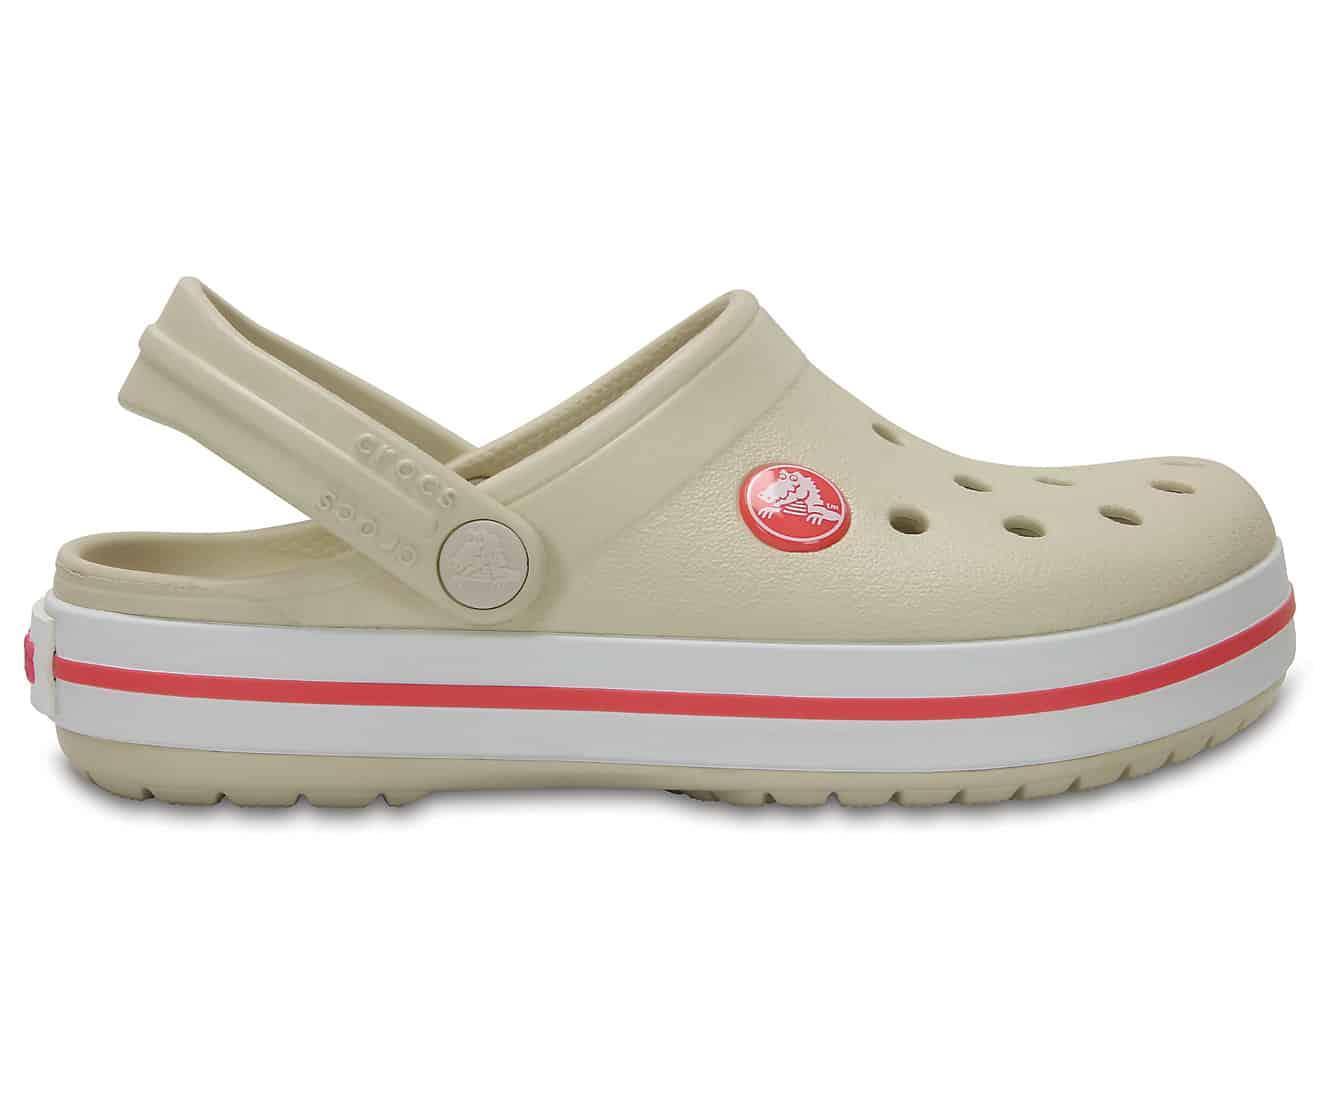 Crocs Crocband Kids Clog Stucco / Melon